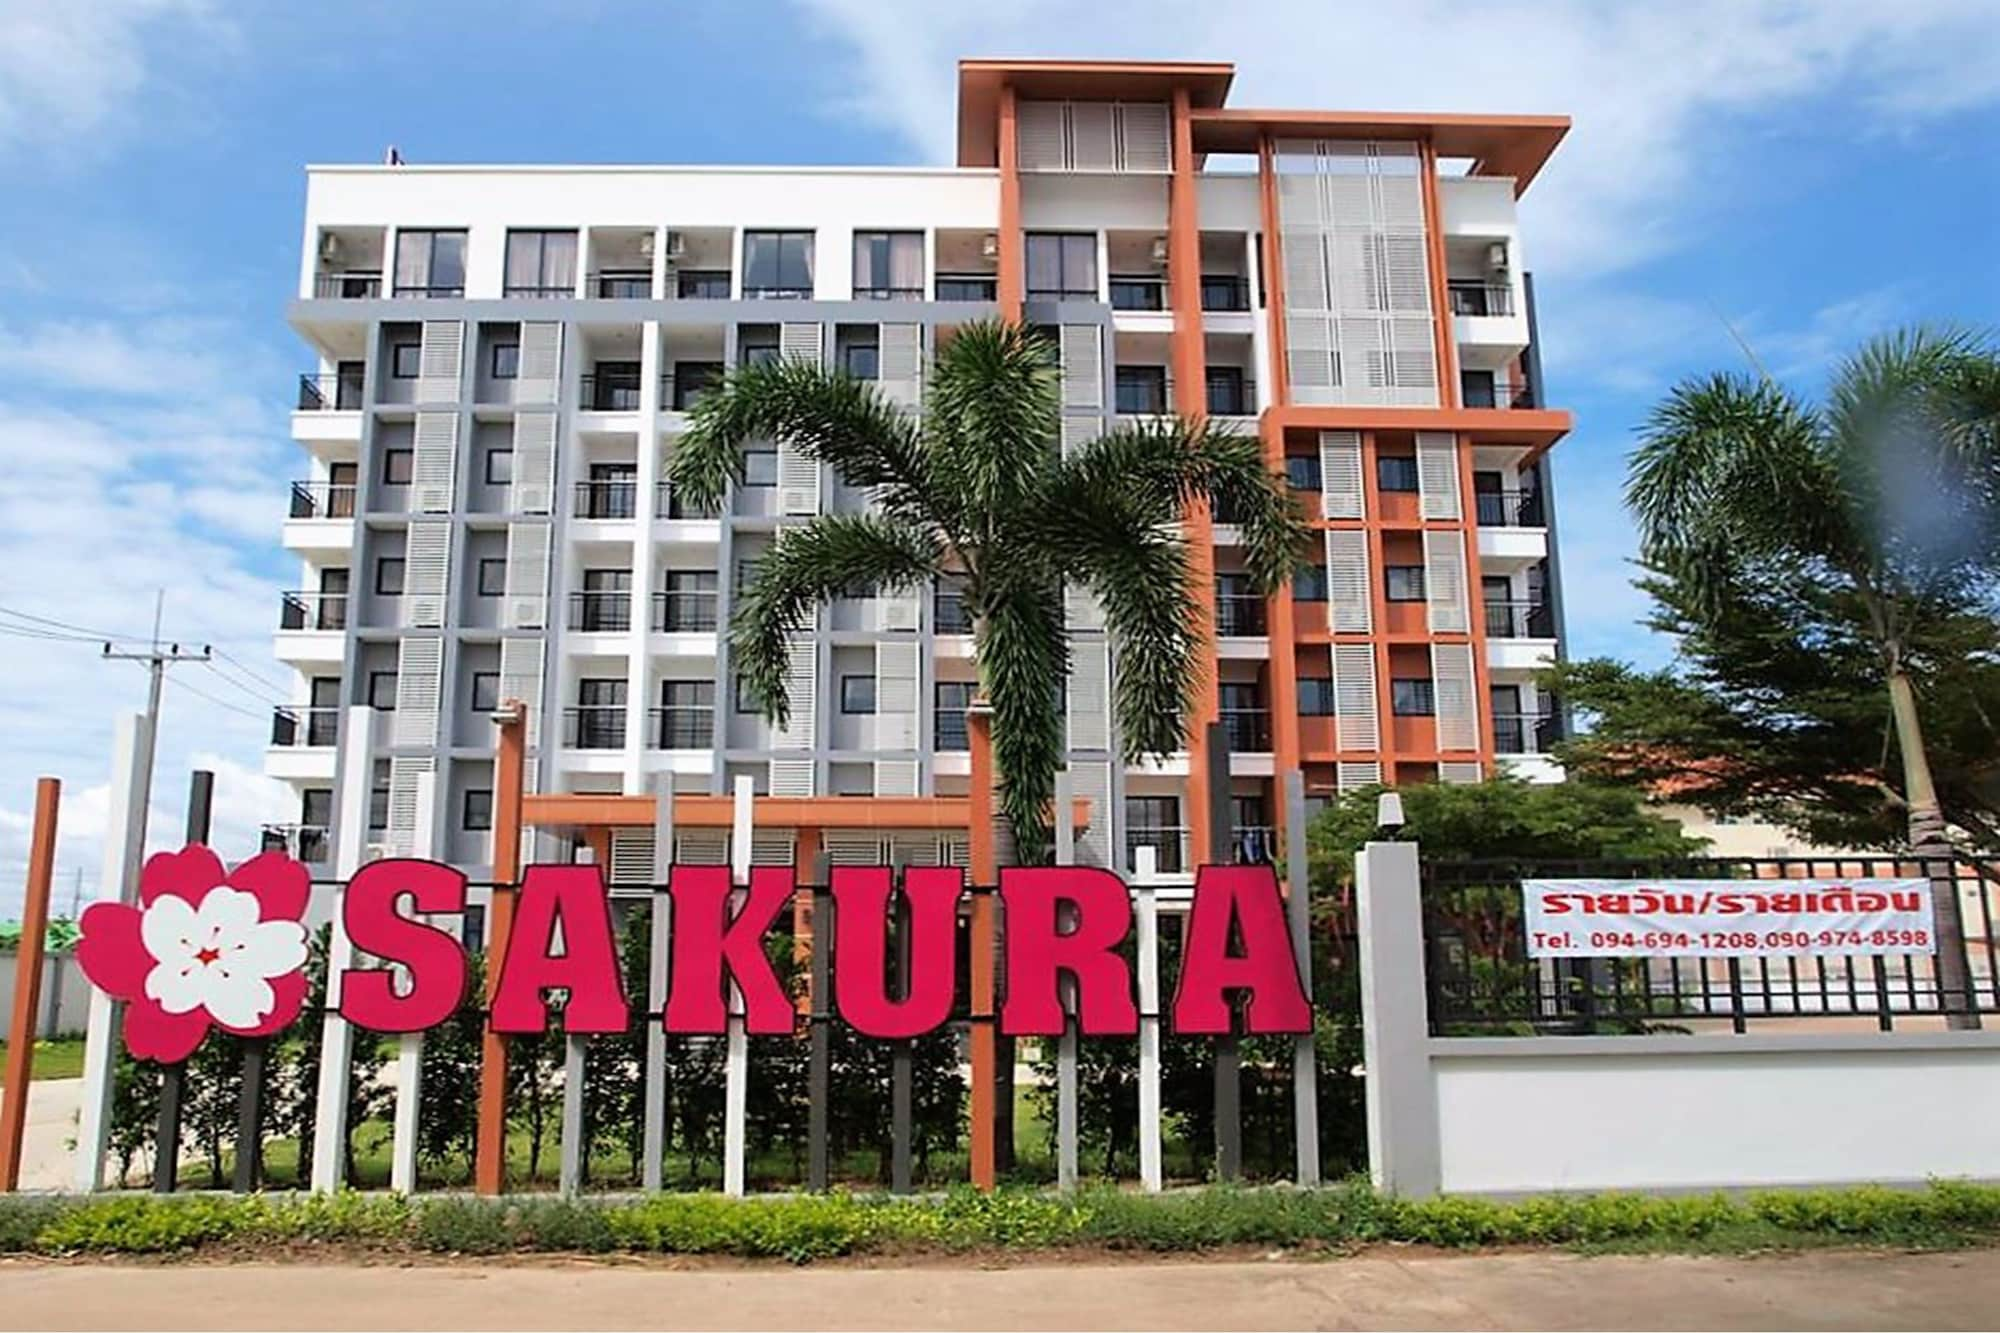 Sakura Boutique Hotel and Residence, Pluak Daeng